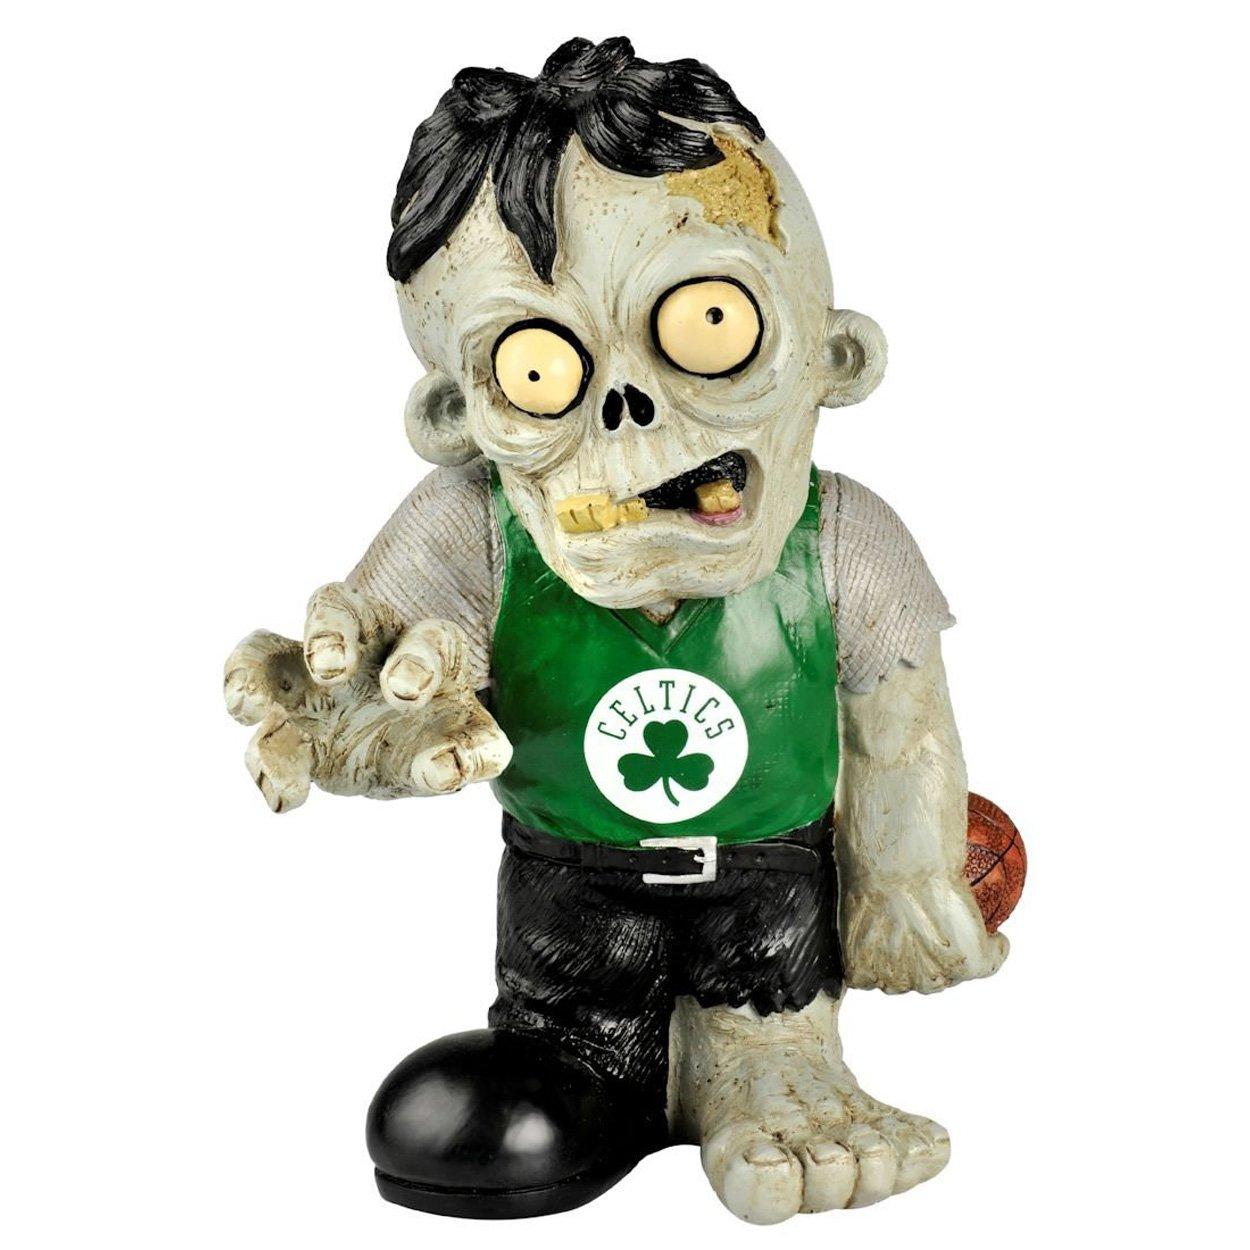 Boston Celtics Resin Zombie Figurine